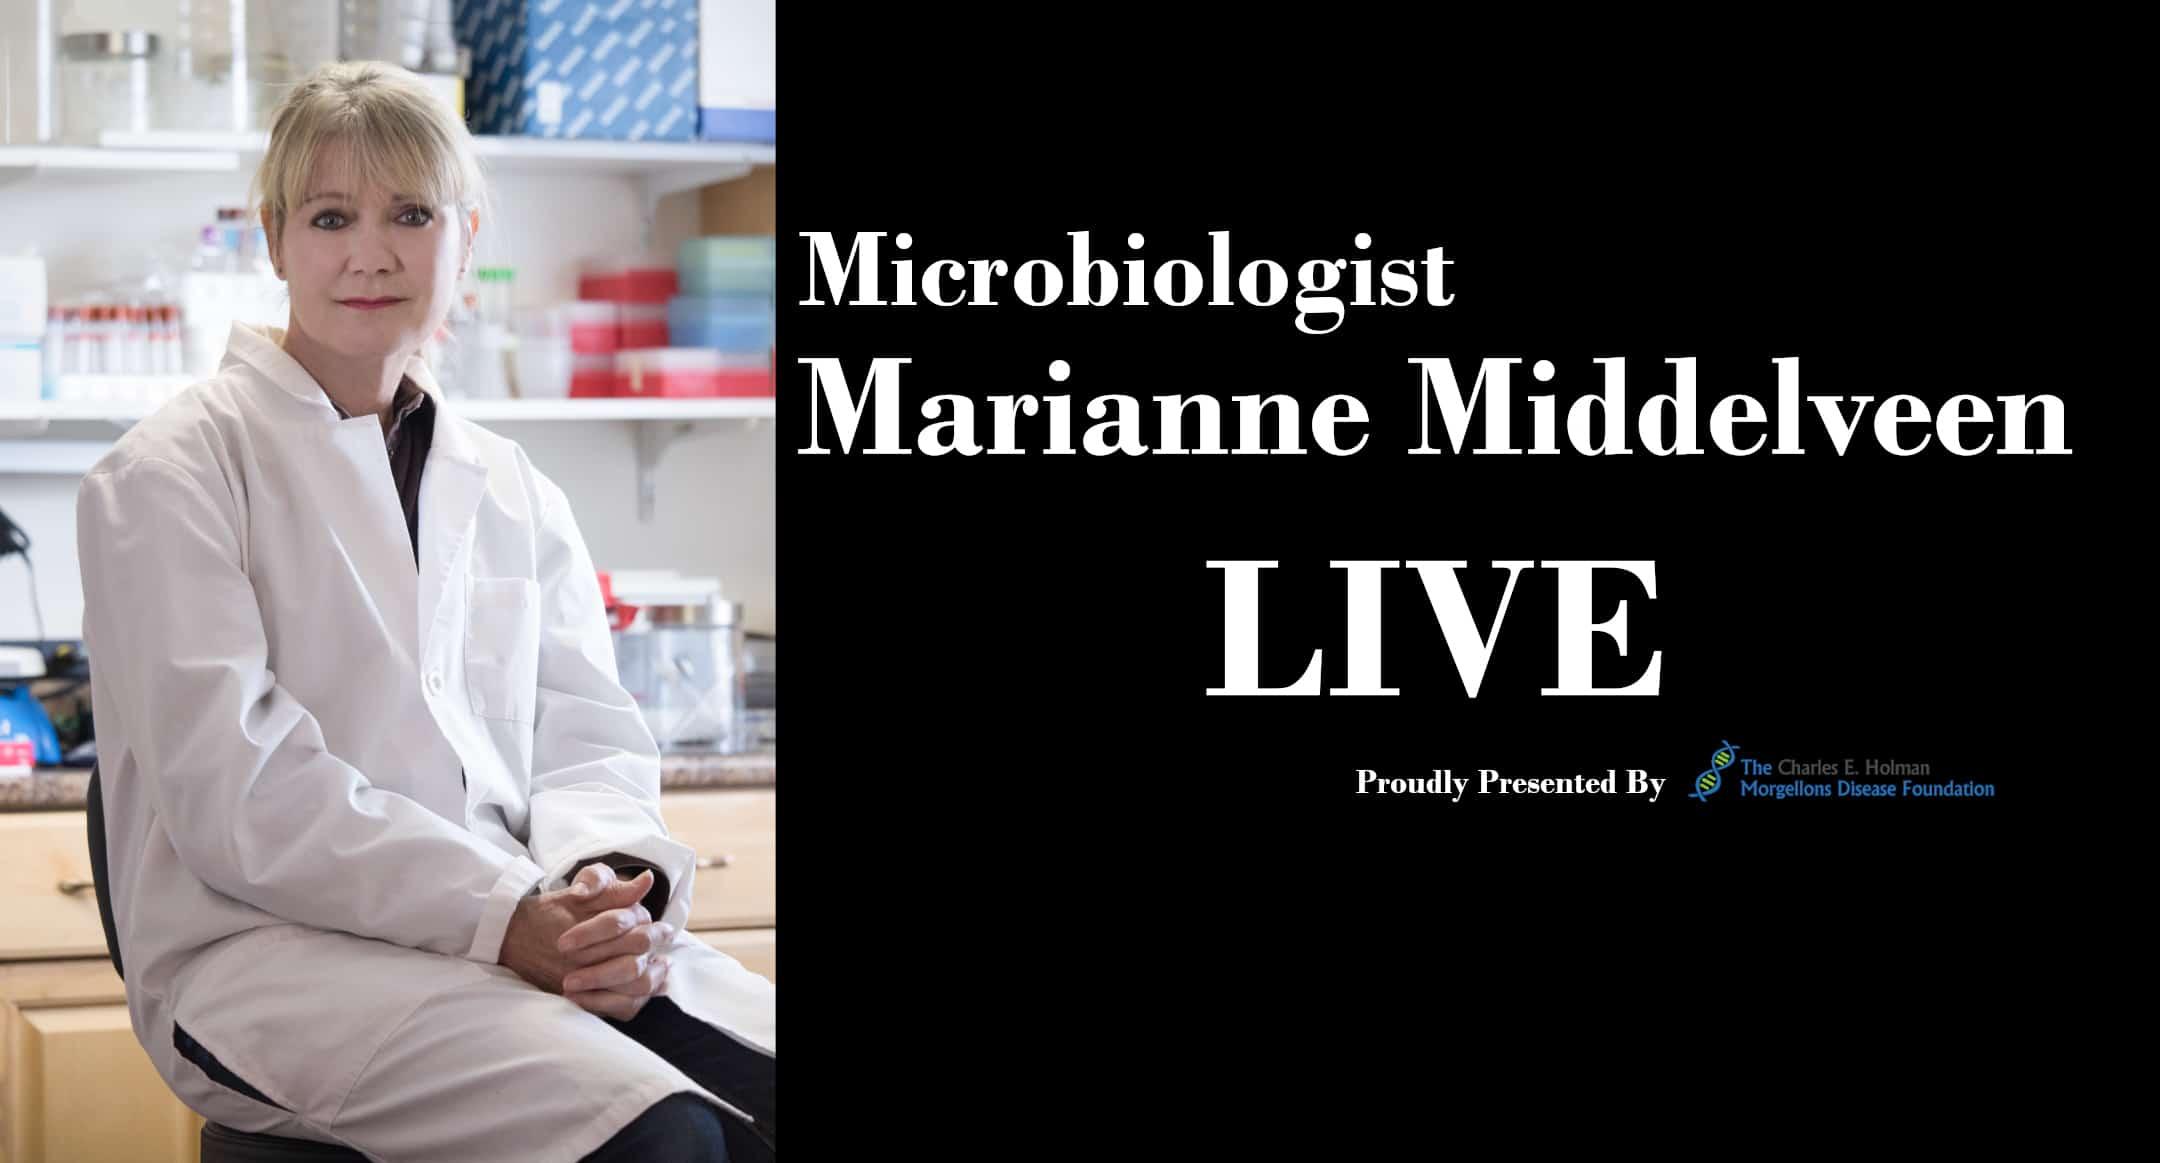 Marianne Middelveen Morgellons Interview